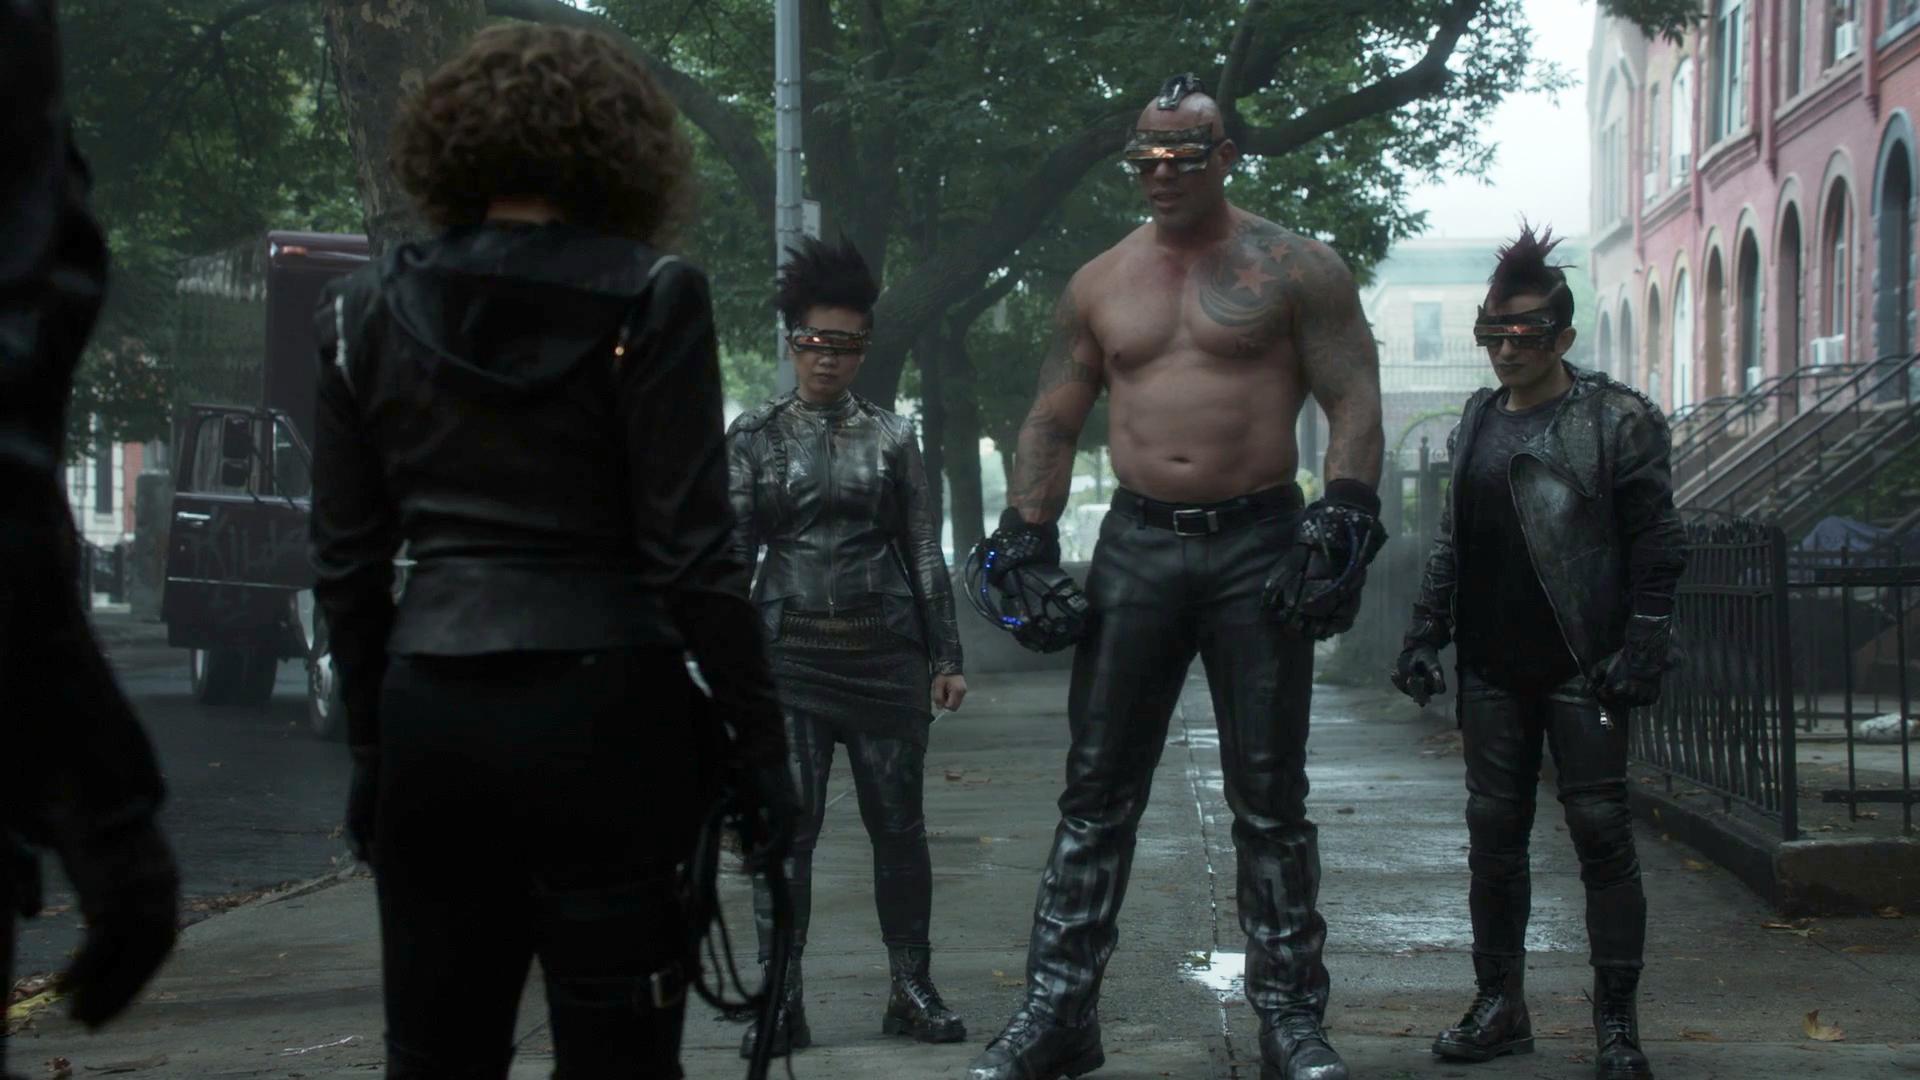 The Mutants (Gotham)